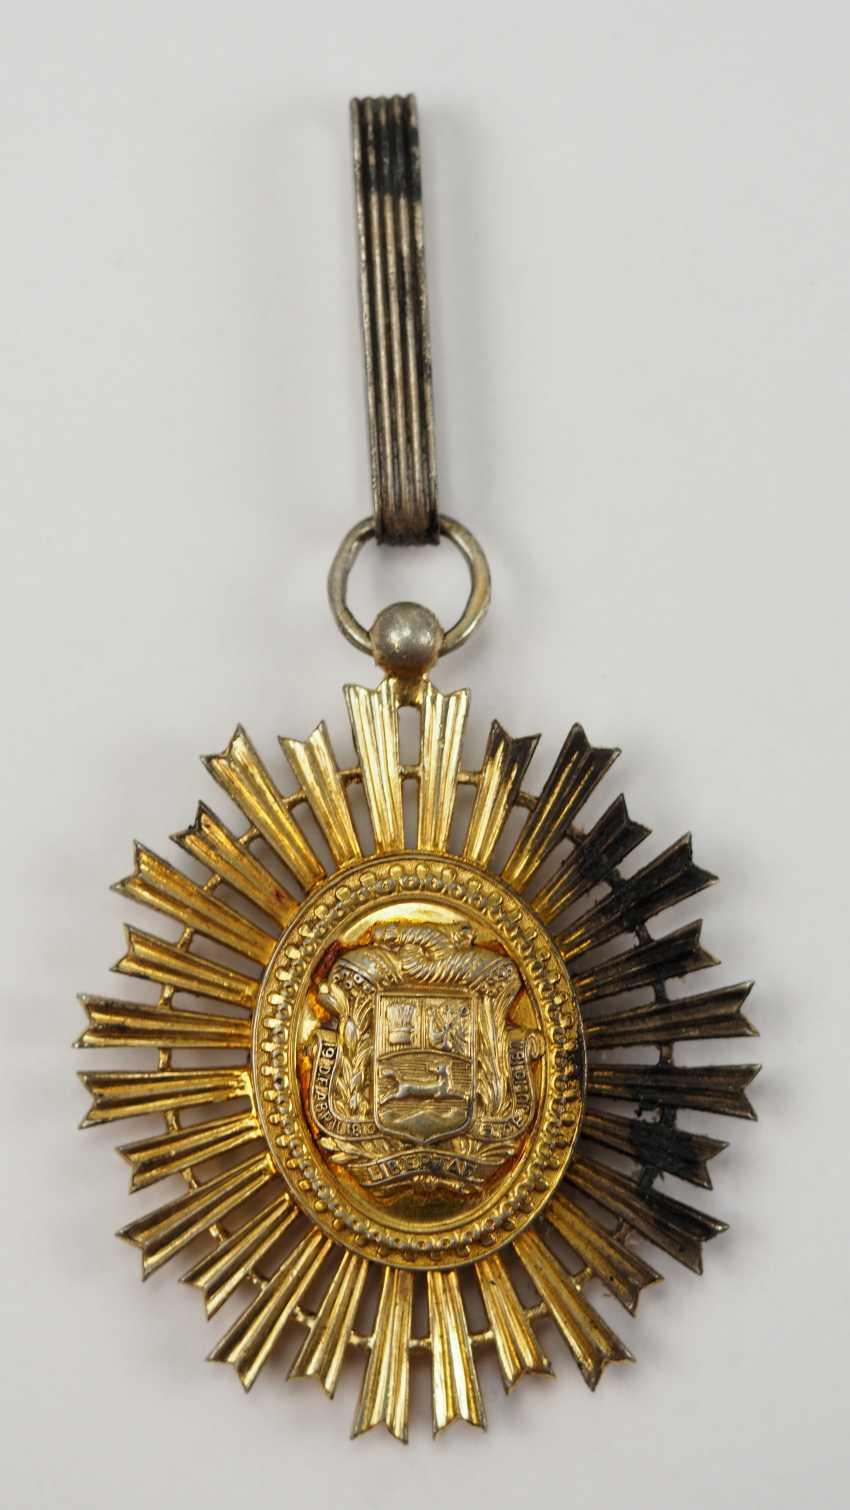 Venezuela: order of the liberator / order of the bust of Bolivar, knight commander's cross. - photo 3